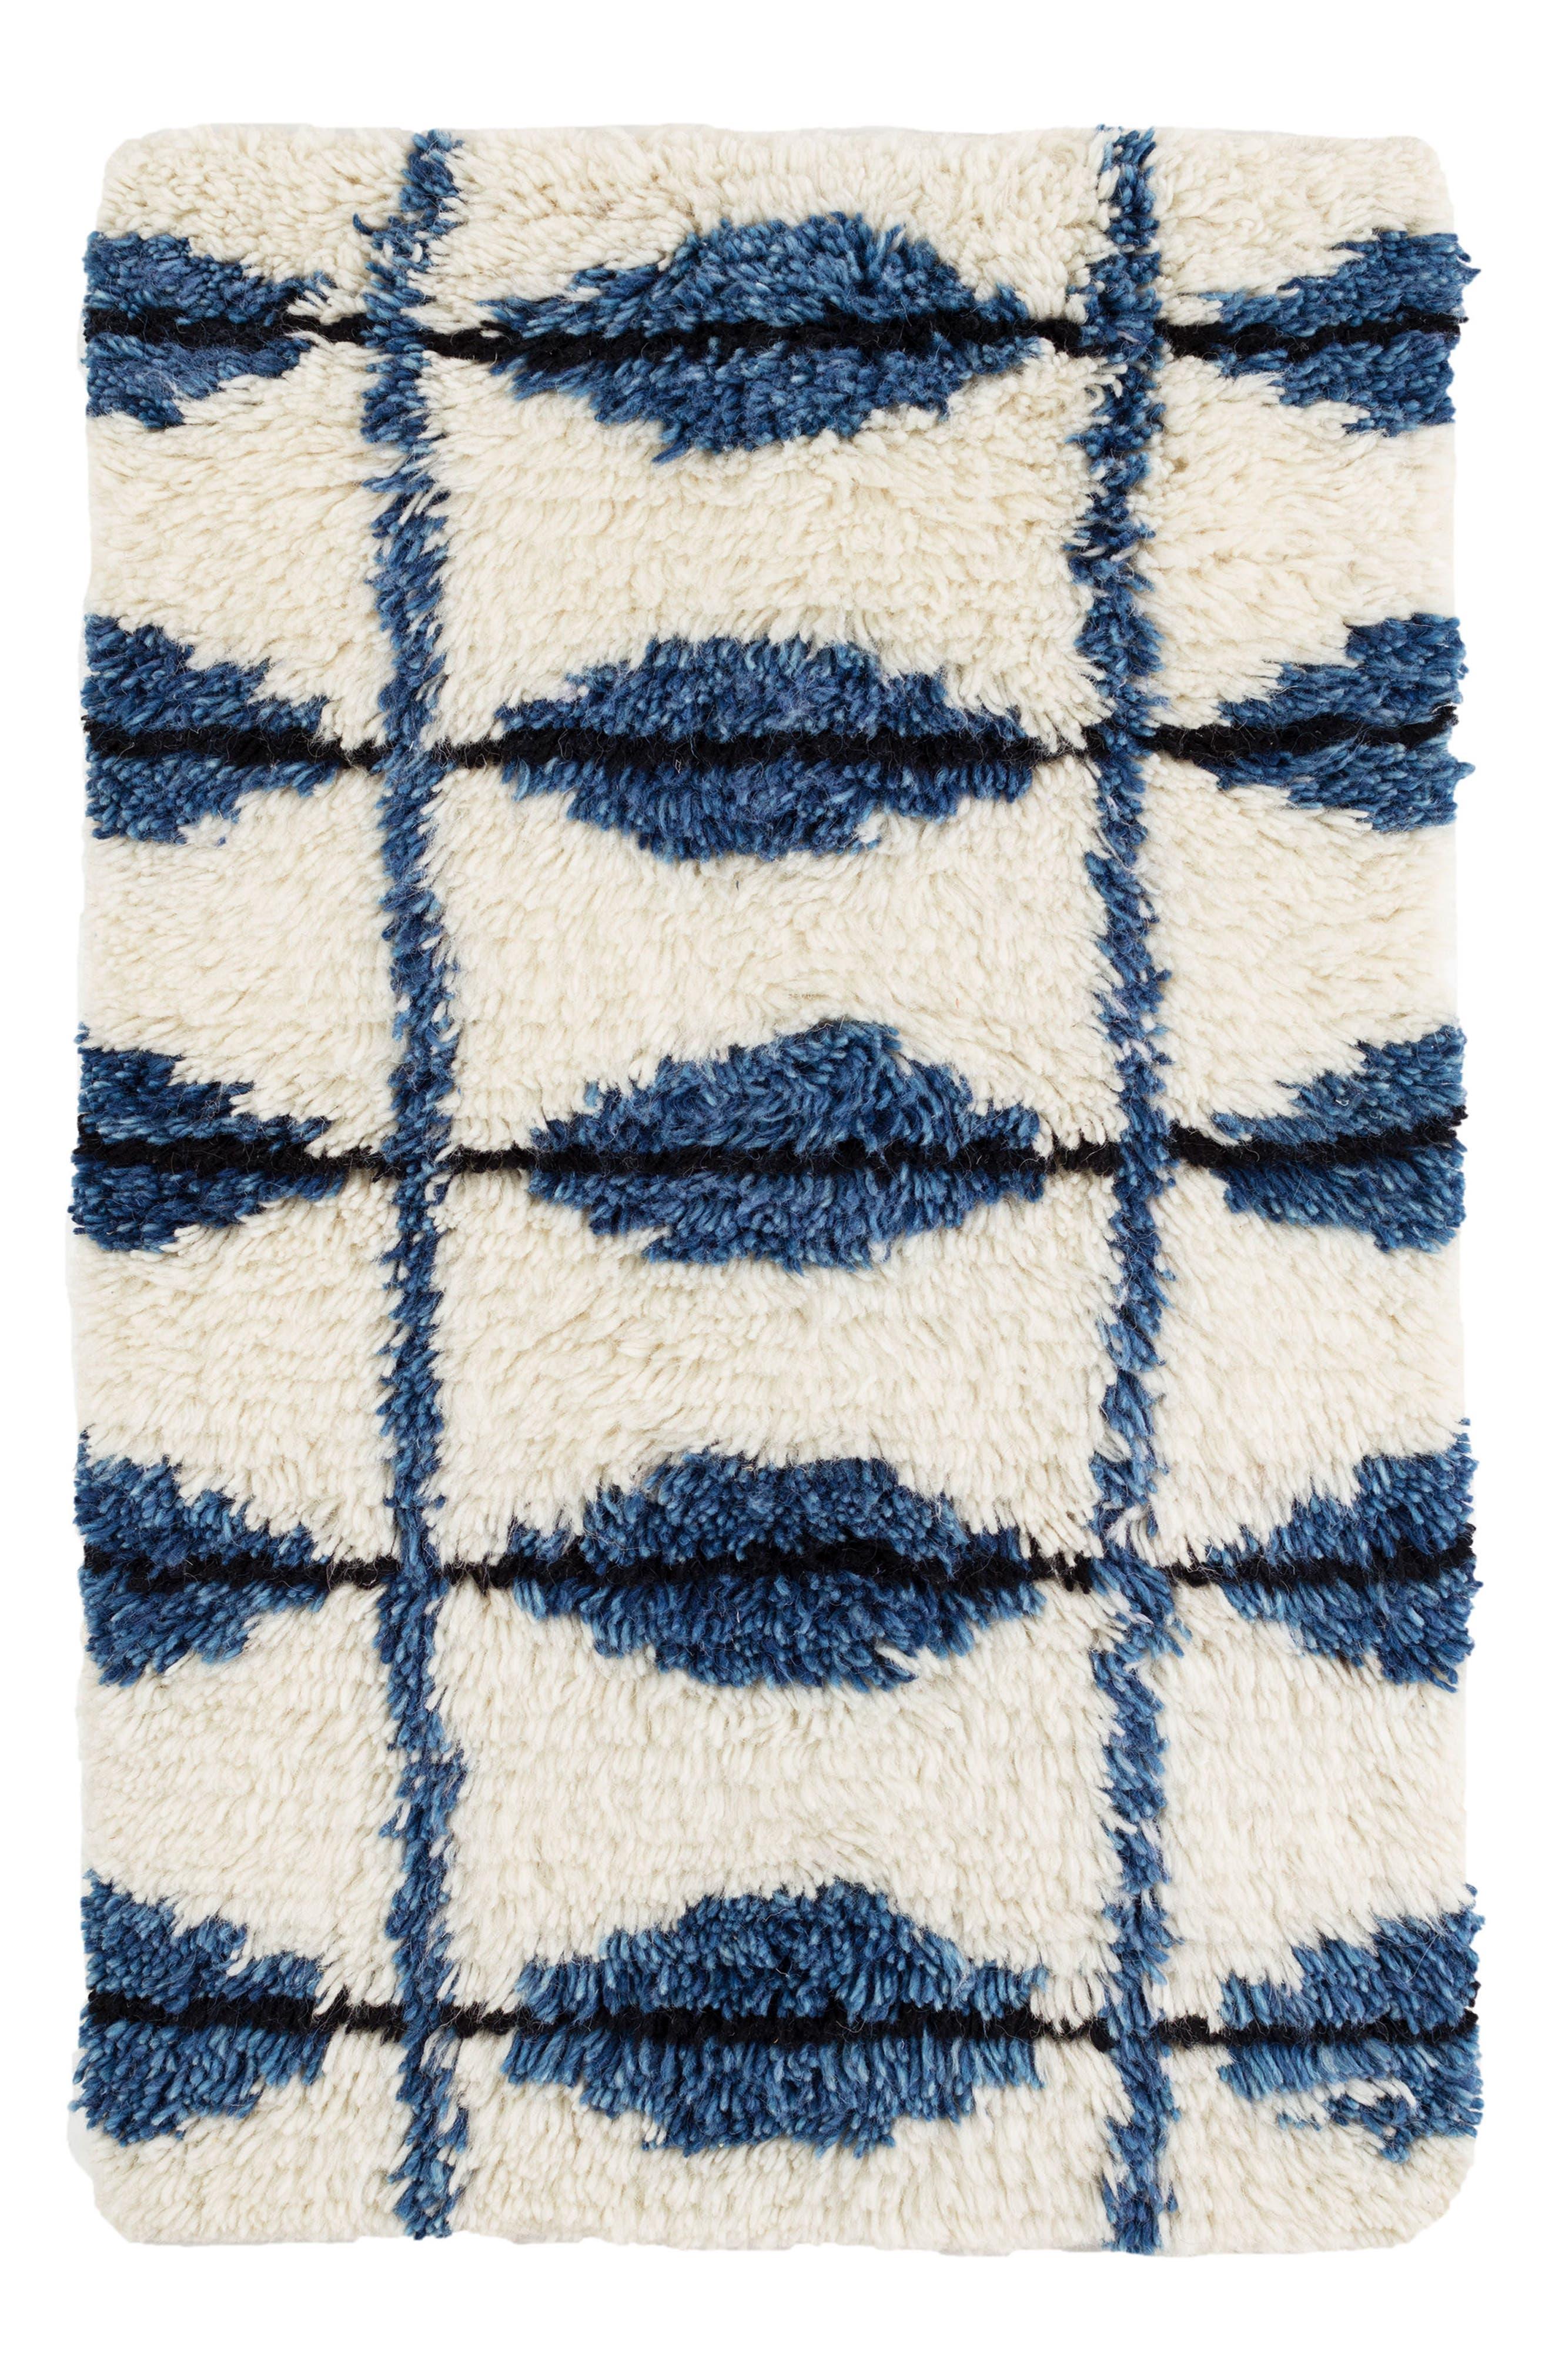 Alternate Image 1 Selected - Dash & Albert Noma Wool Blend Rug